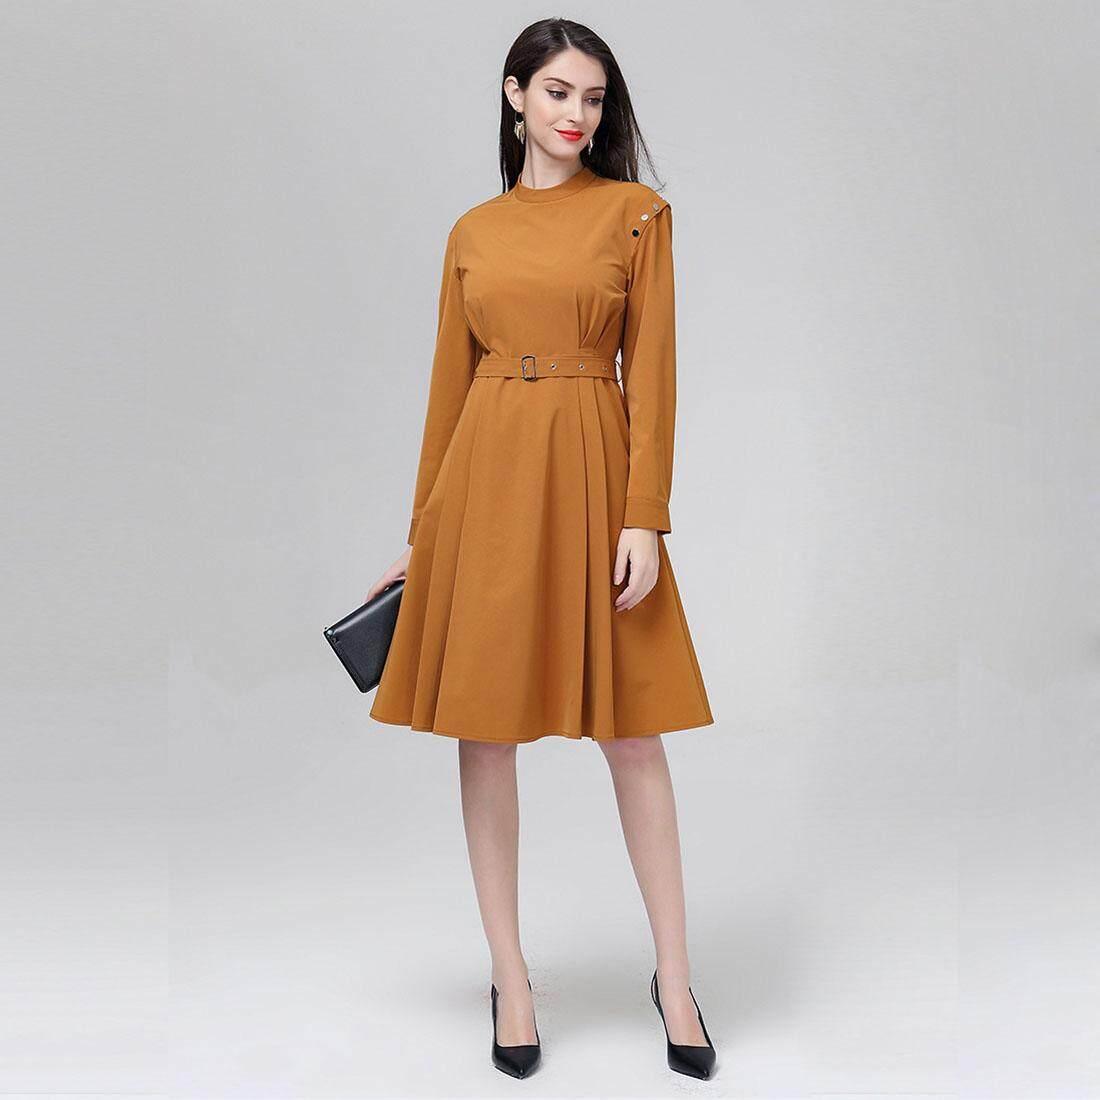 Marina Kaneva New Europe and the United States Spring High Waist Round Neck Dress Solid Color Elegant Slim Dress(Caramel,M/US-4/UK-8)